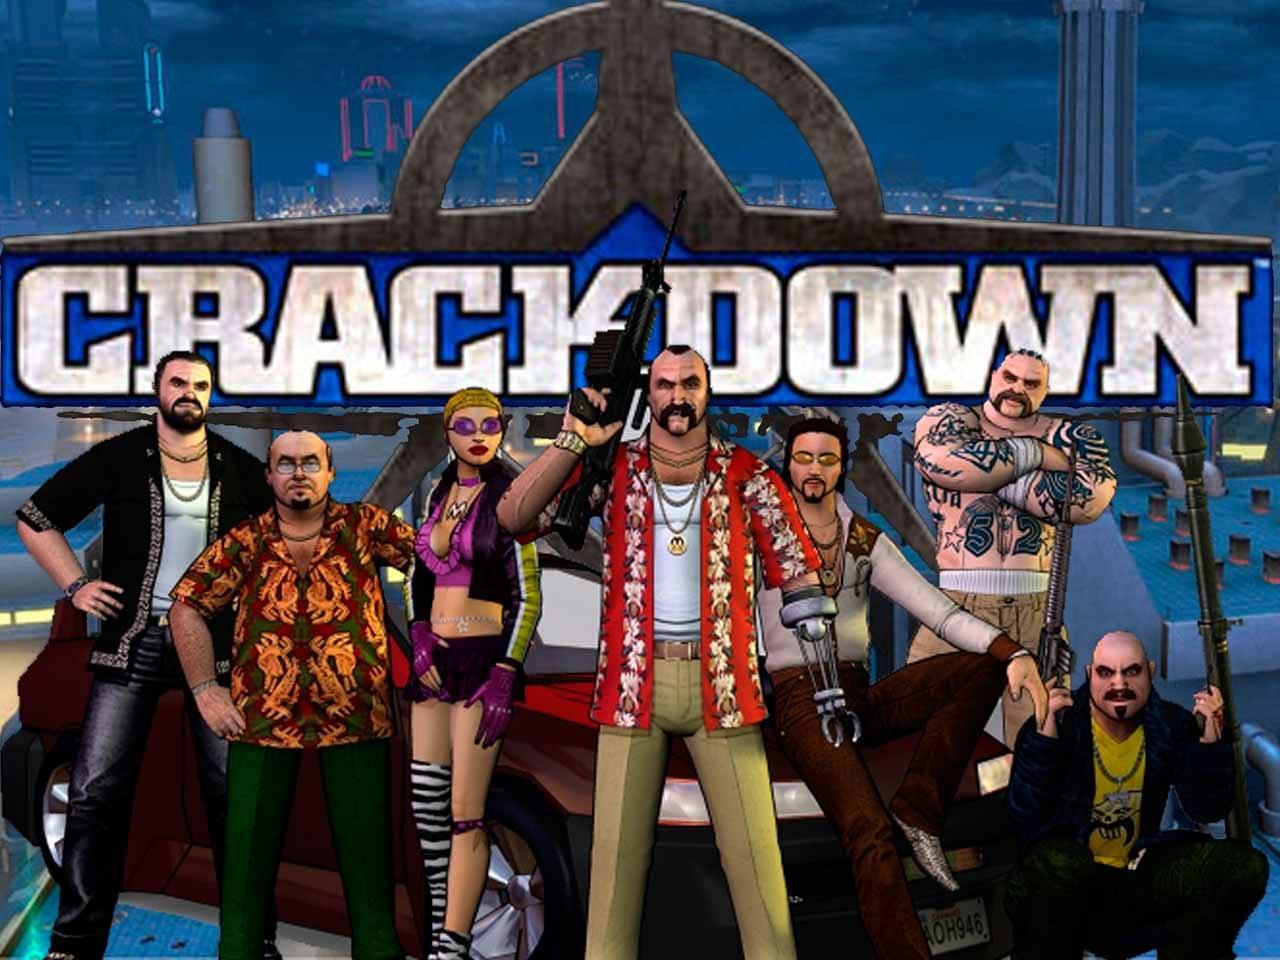 Novo Crackdown revelado na E3